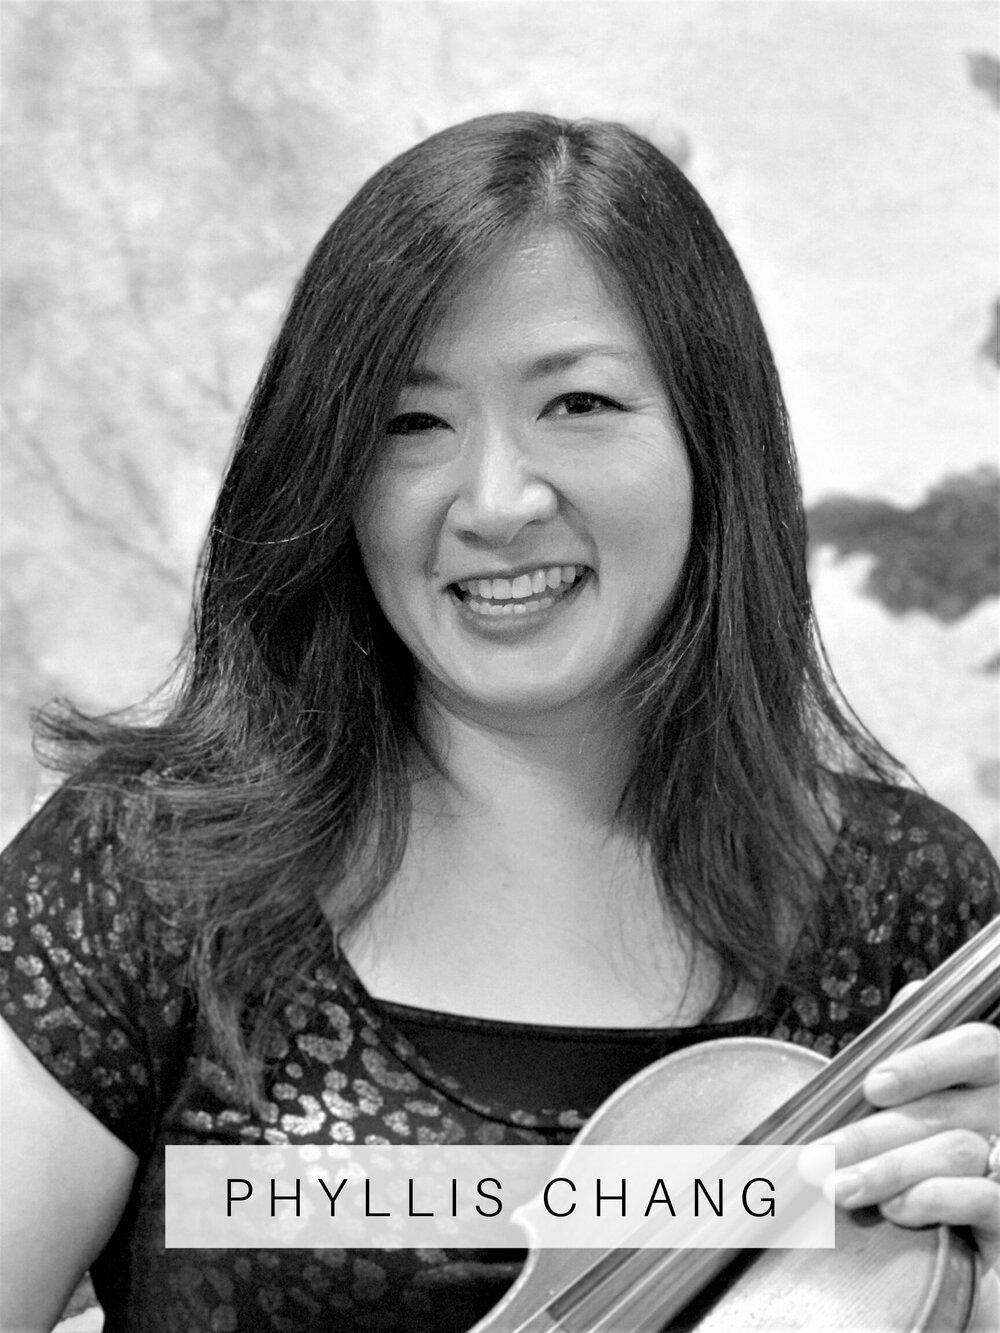 Phyllis Chang